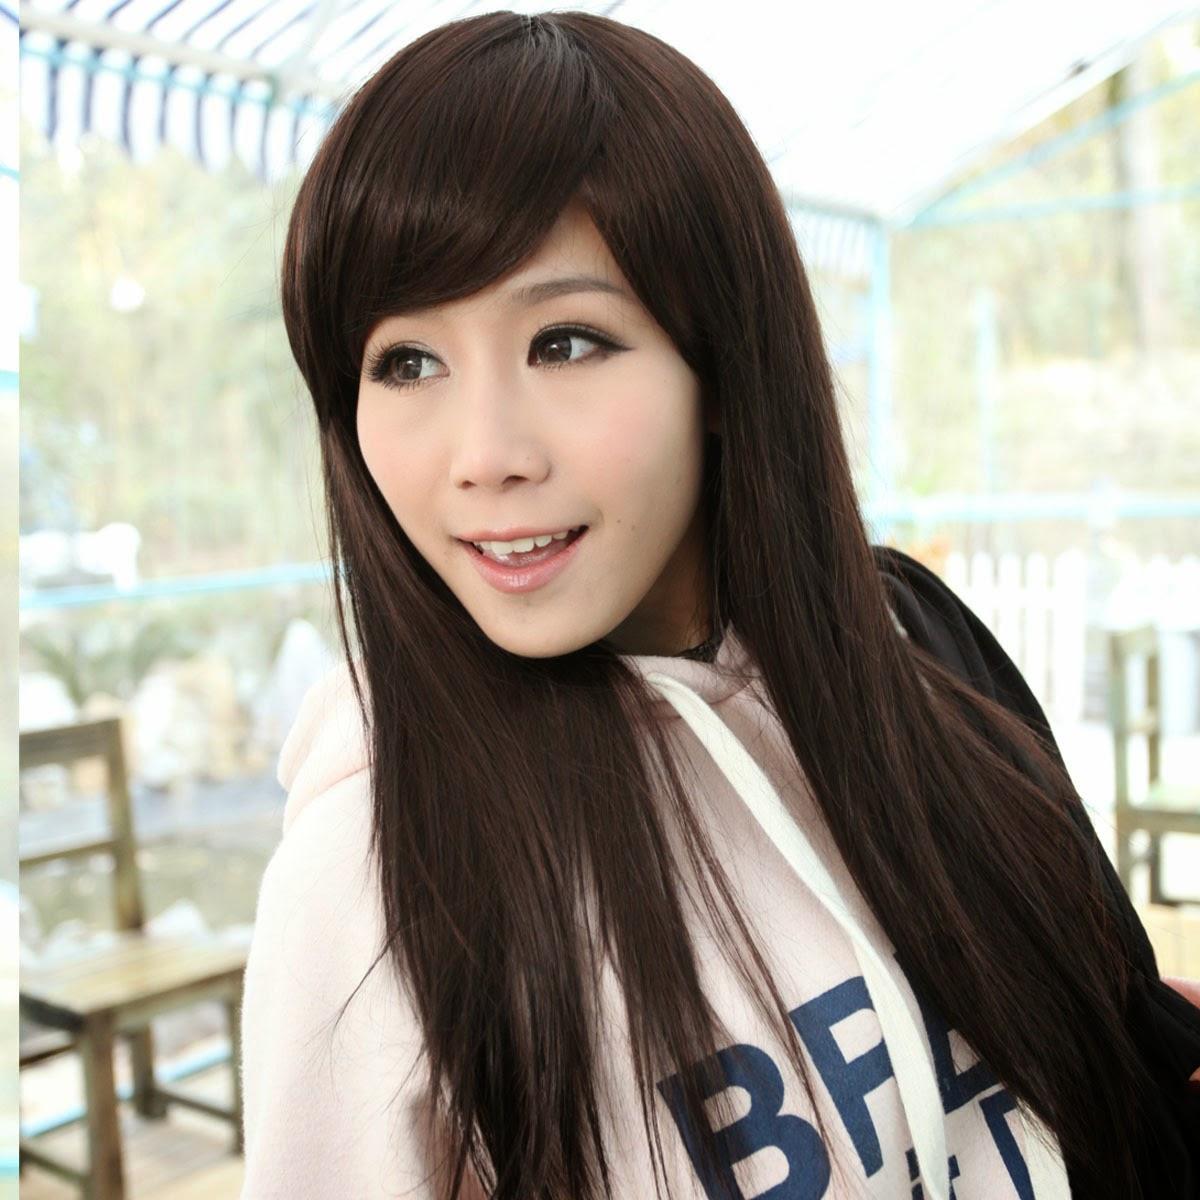 mujeres chinas con cabello liso